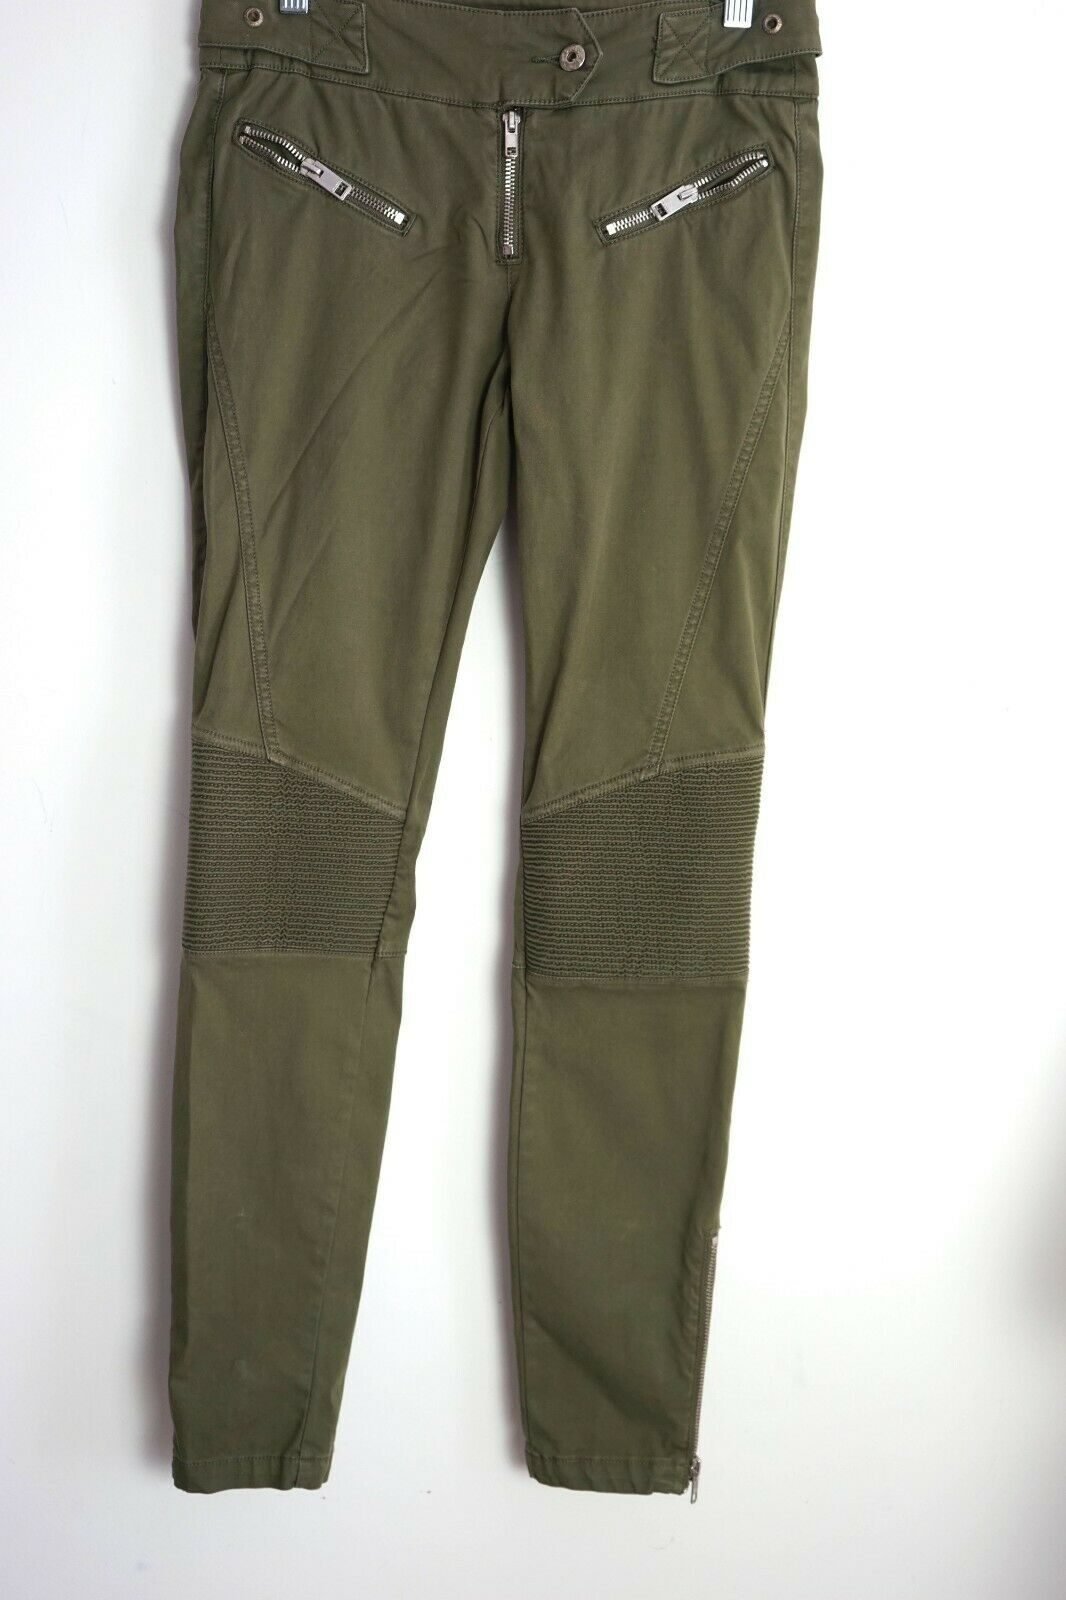 Diesel Biker style Military Olive Grün Pants Knee patch Sz 27